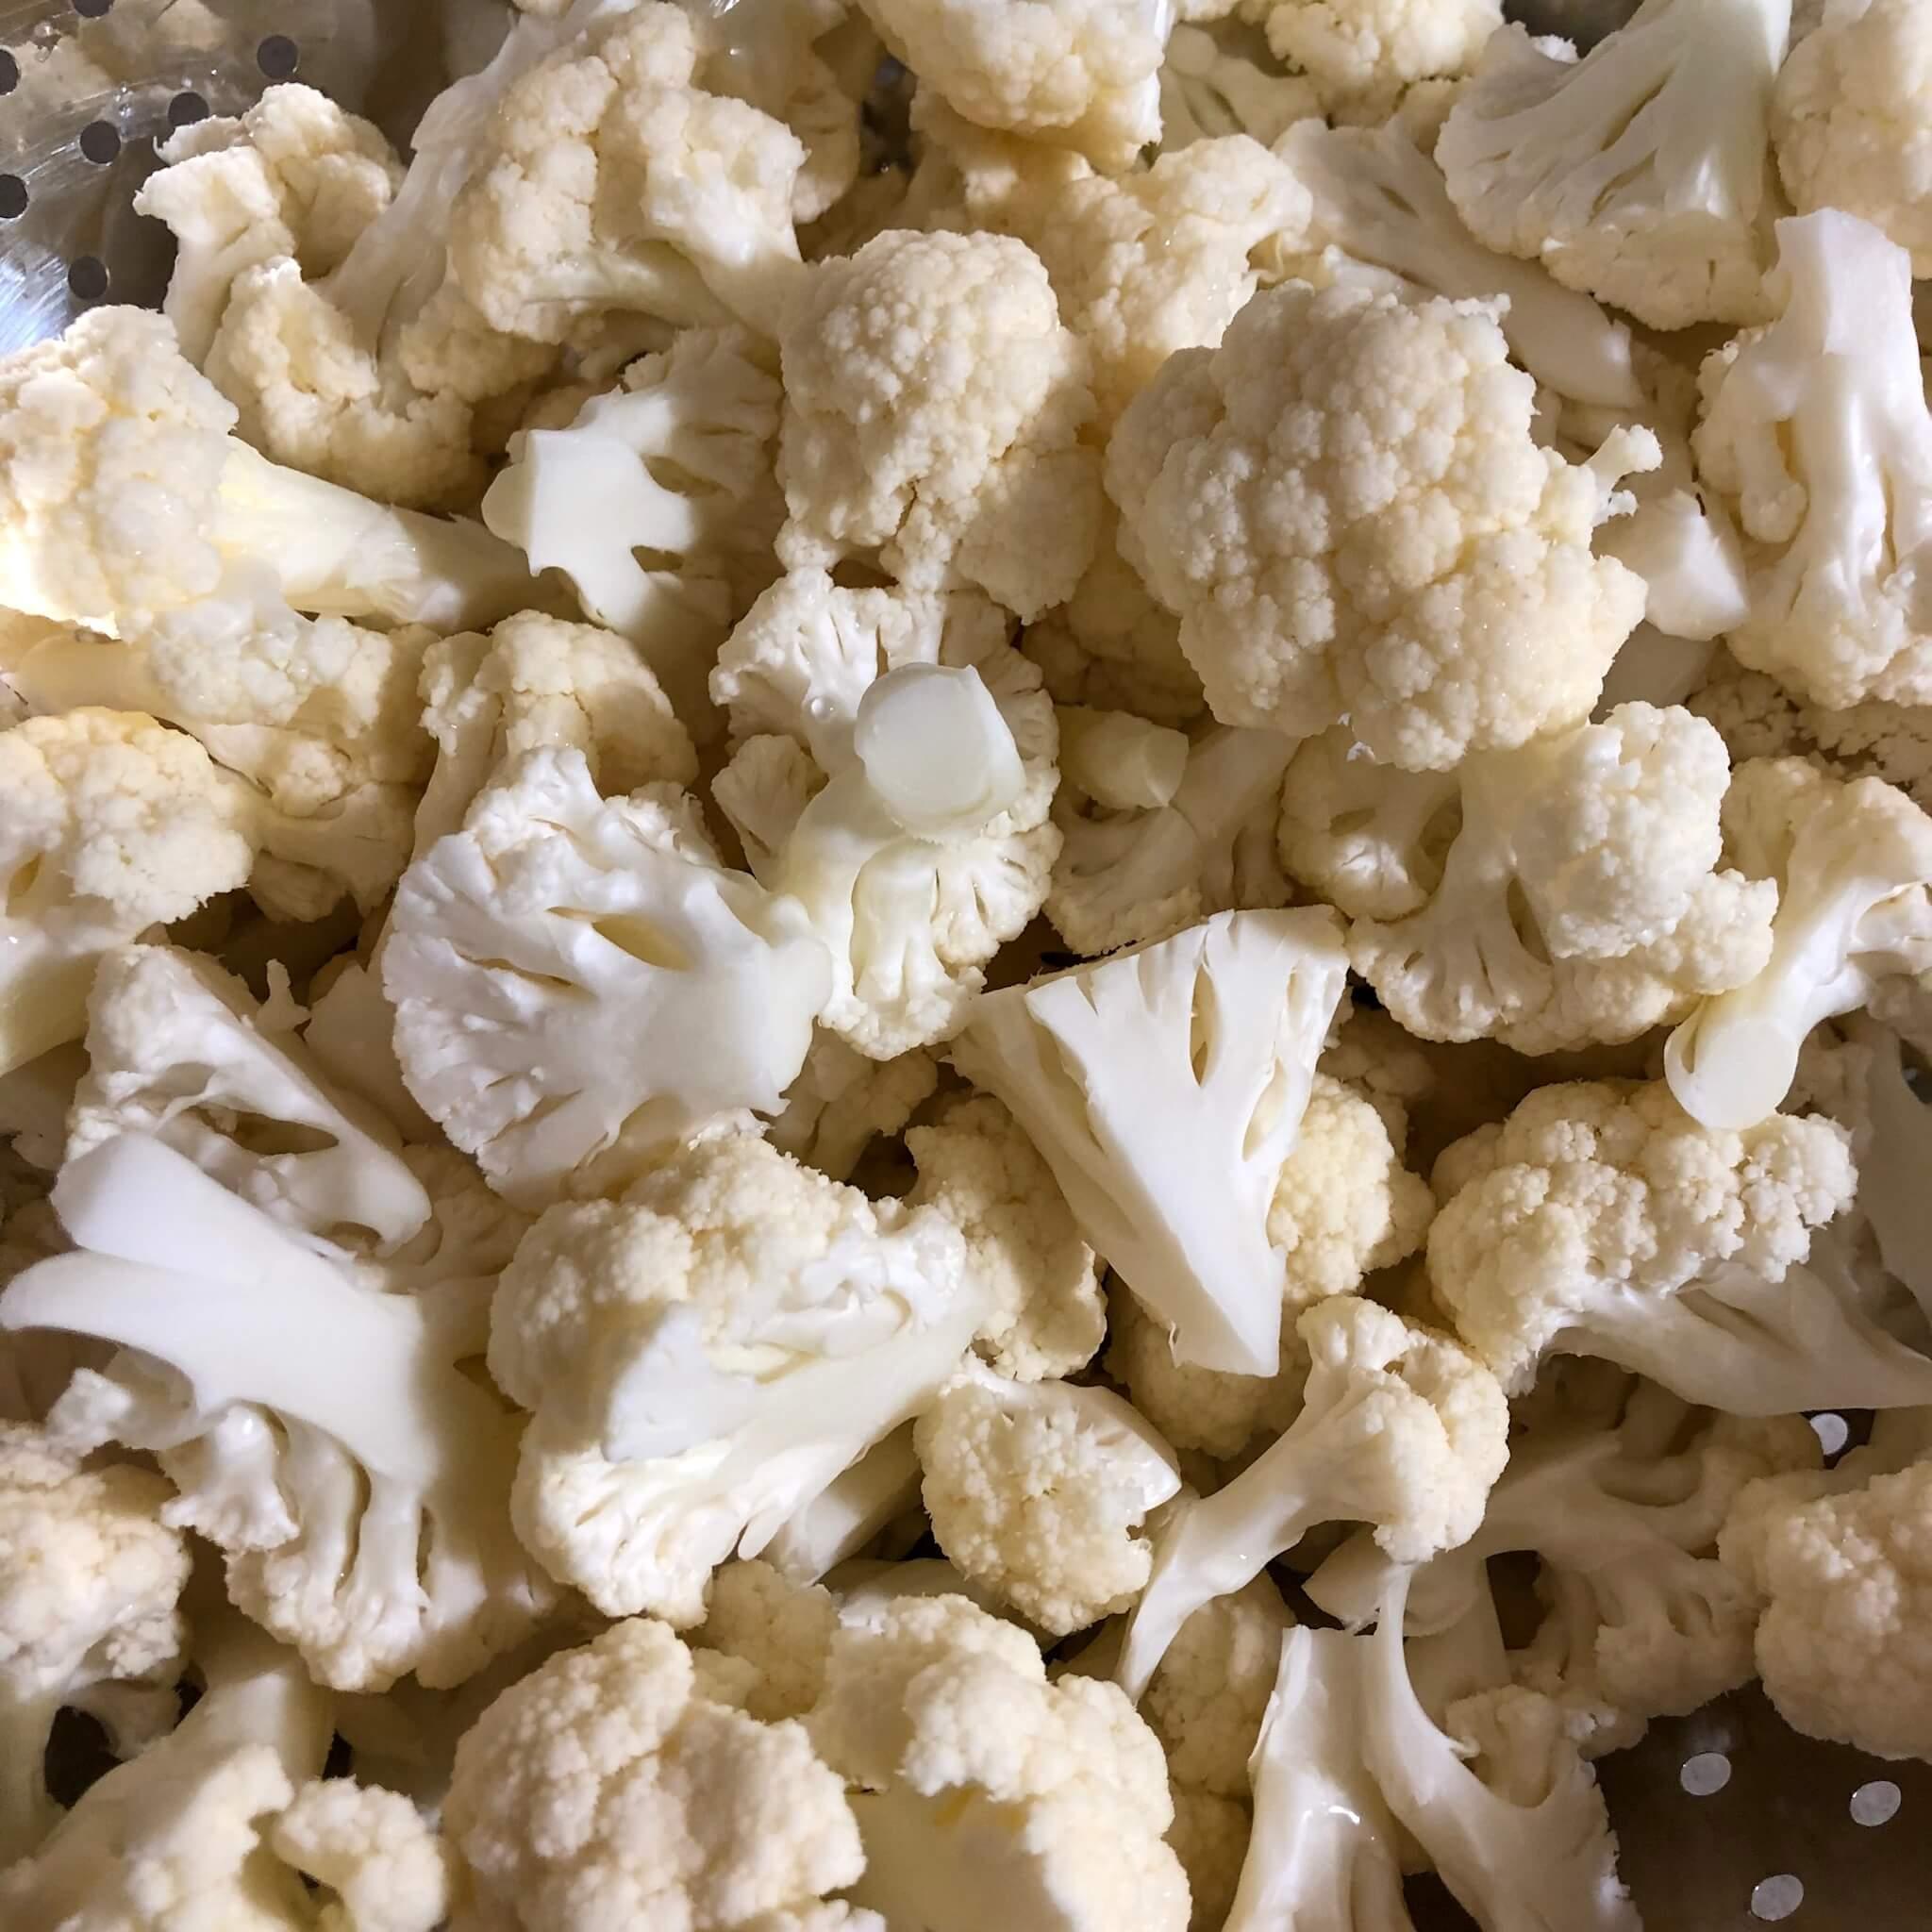 cauliflower chopped into small pieces for cauliflower recipes